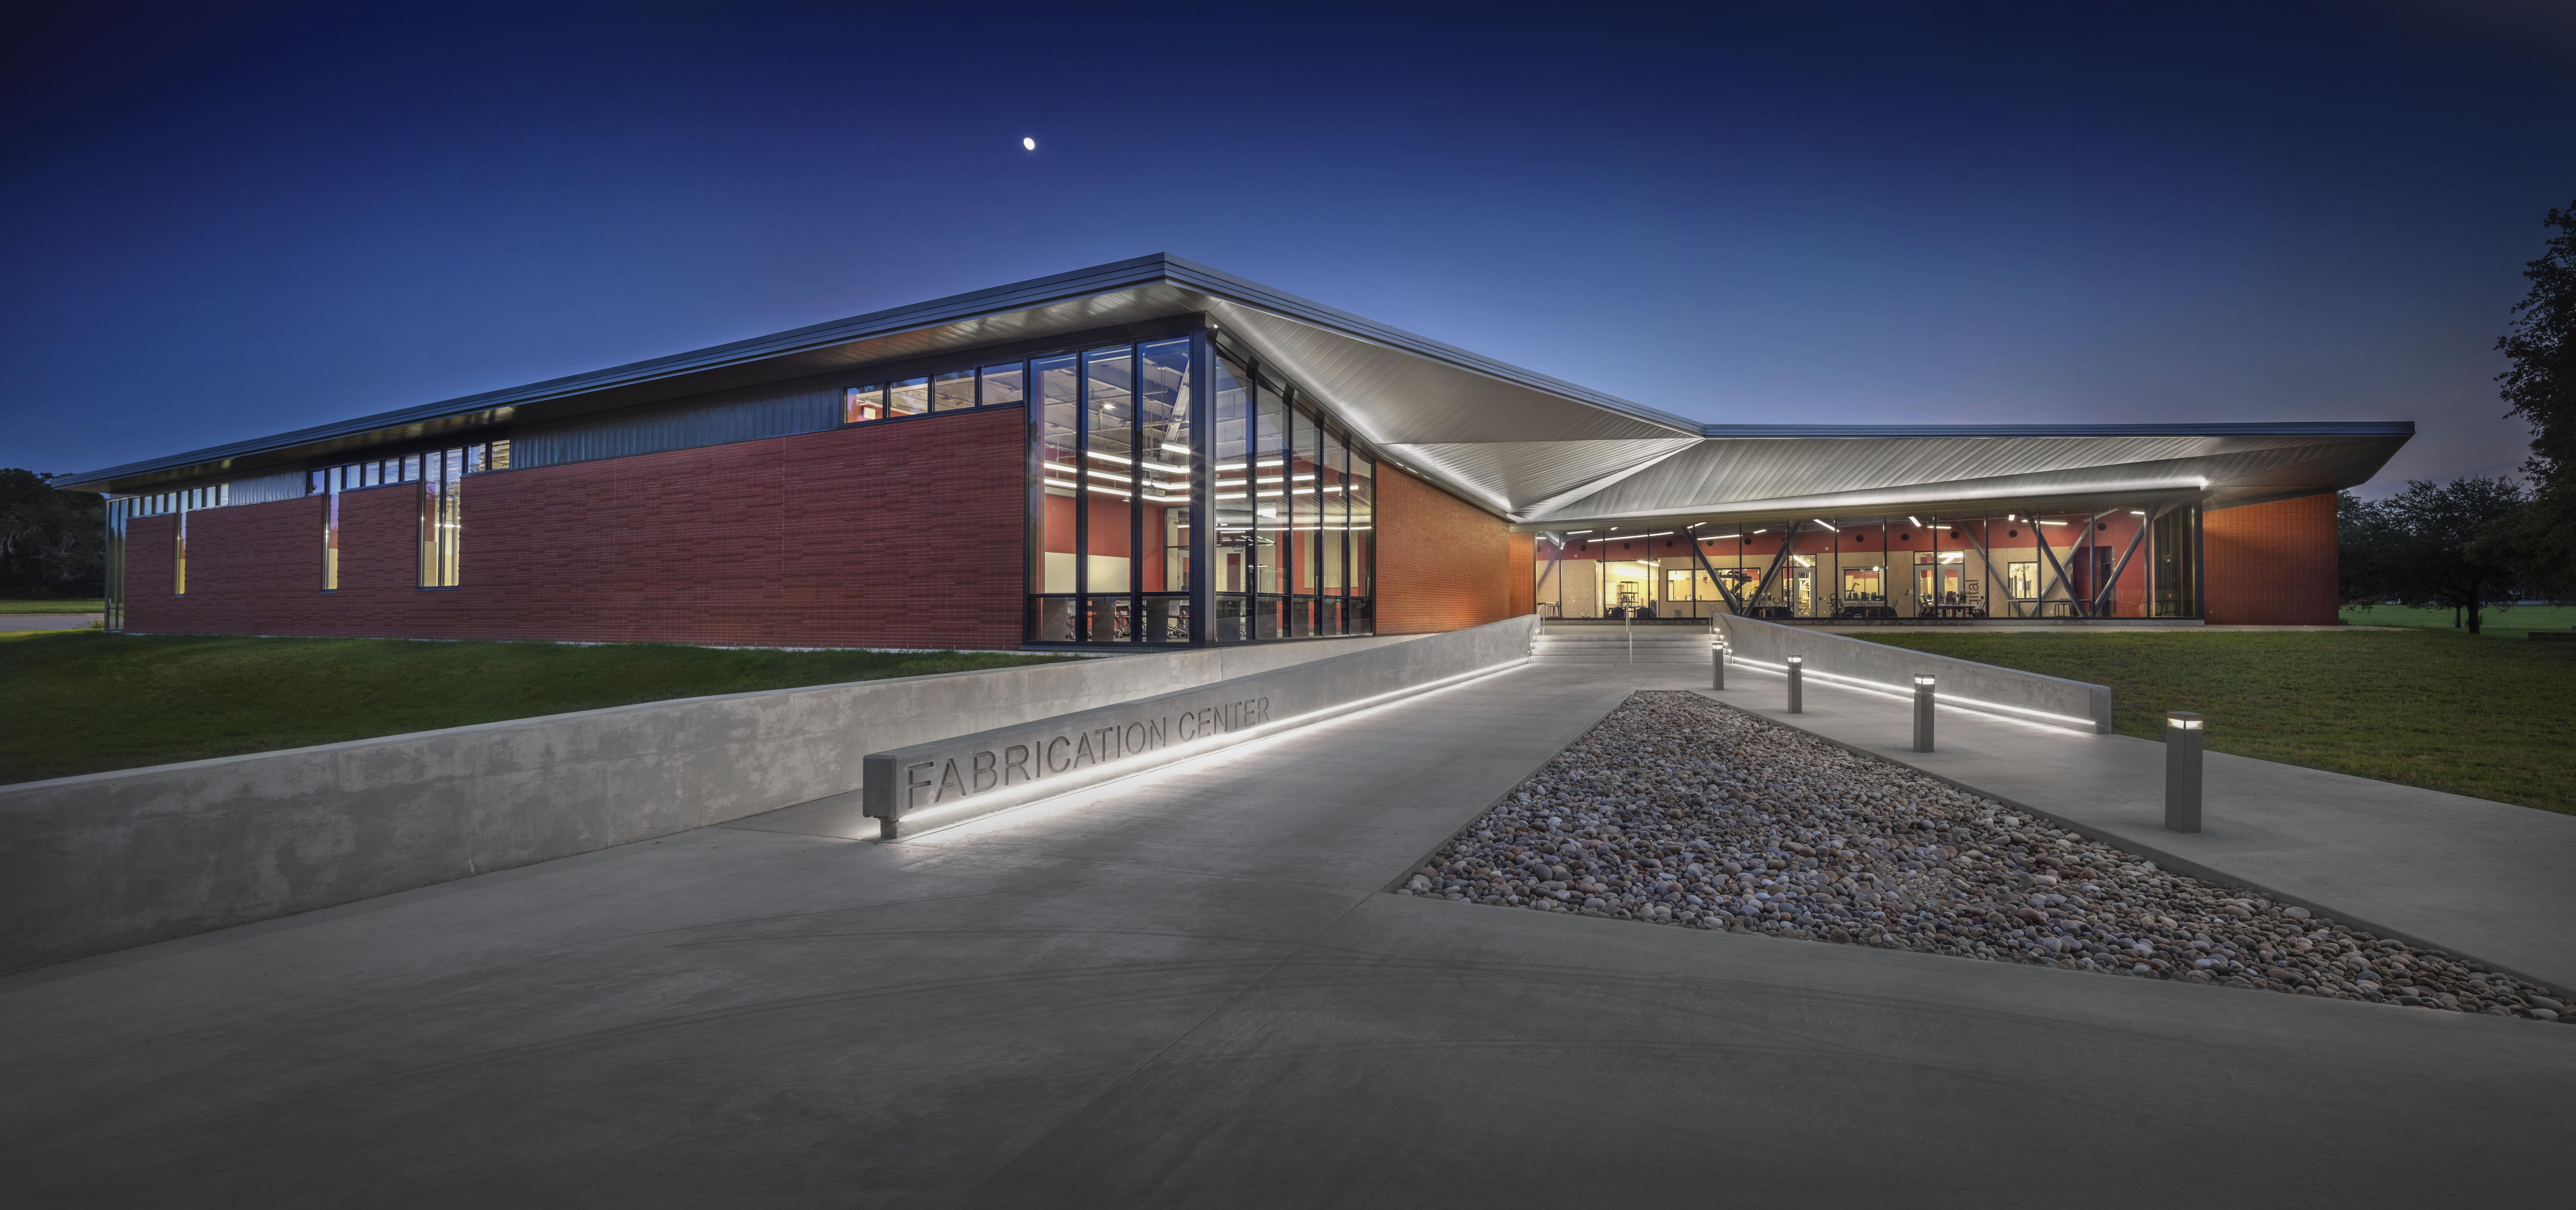 Prairie View A&M University - Prairie View A&M University Fabrication Center